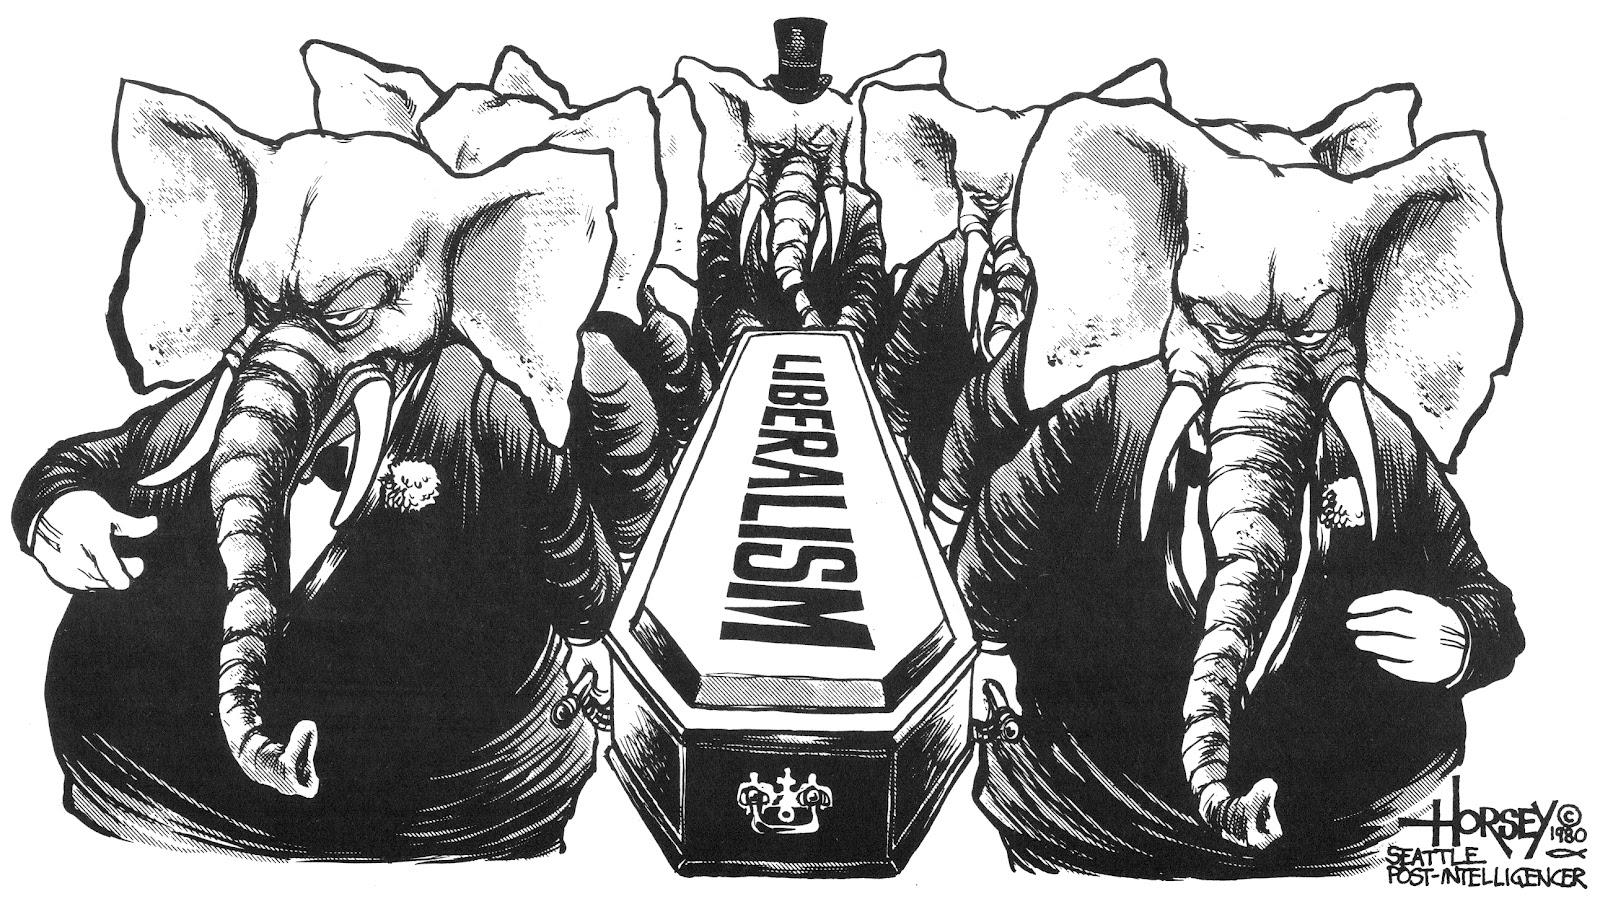 Guardian readers: Iraq war was not justified